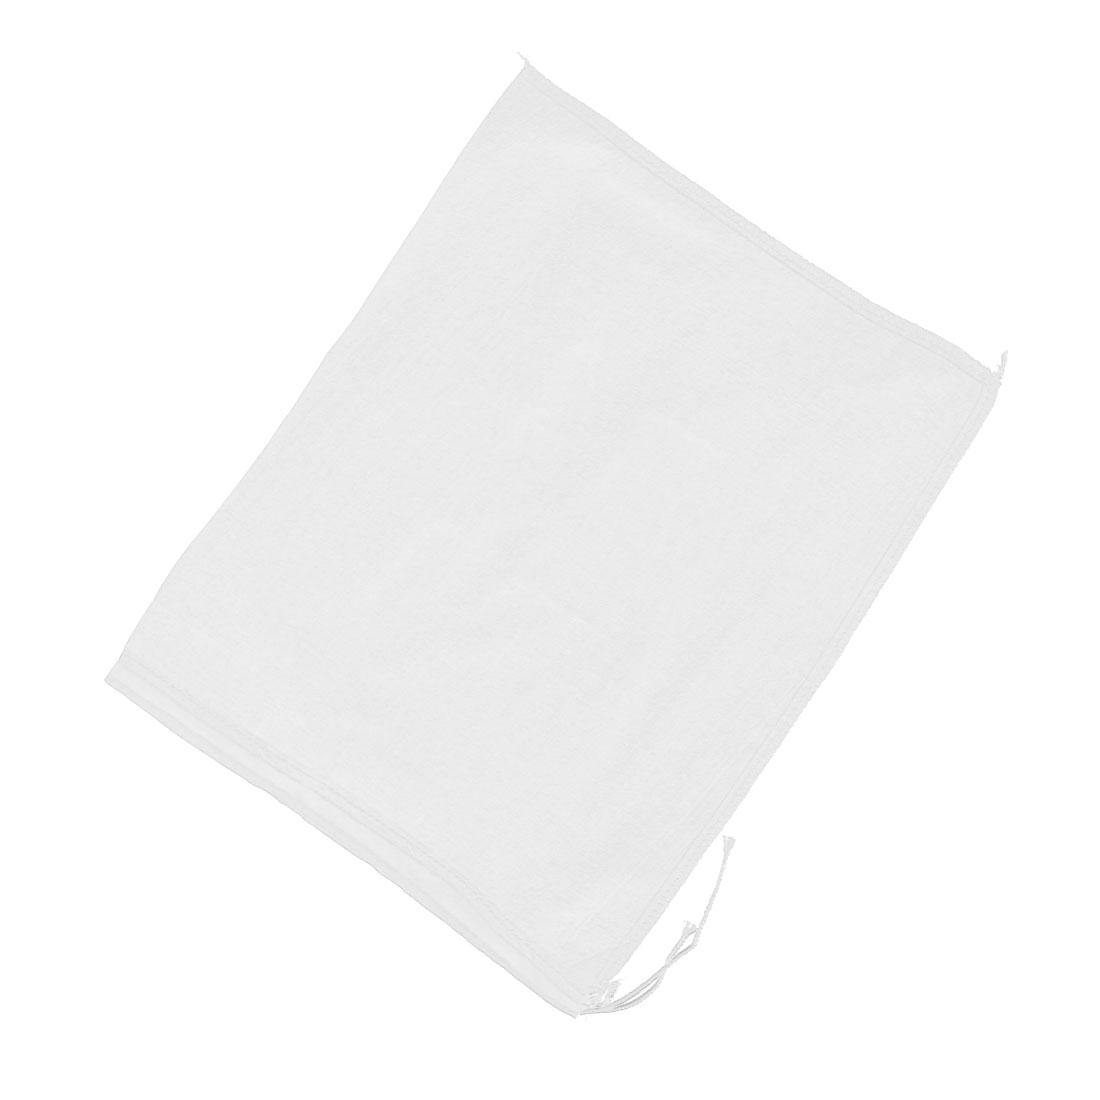 Kitchen Drawstring Seal Soup Food Filter Mesh Bag 35.5cm x 29cm White